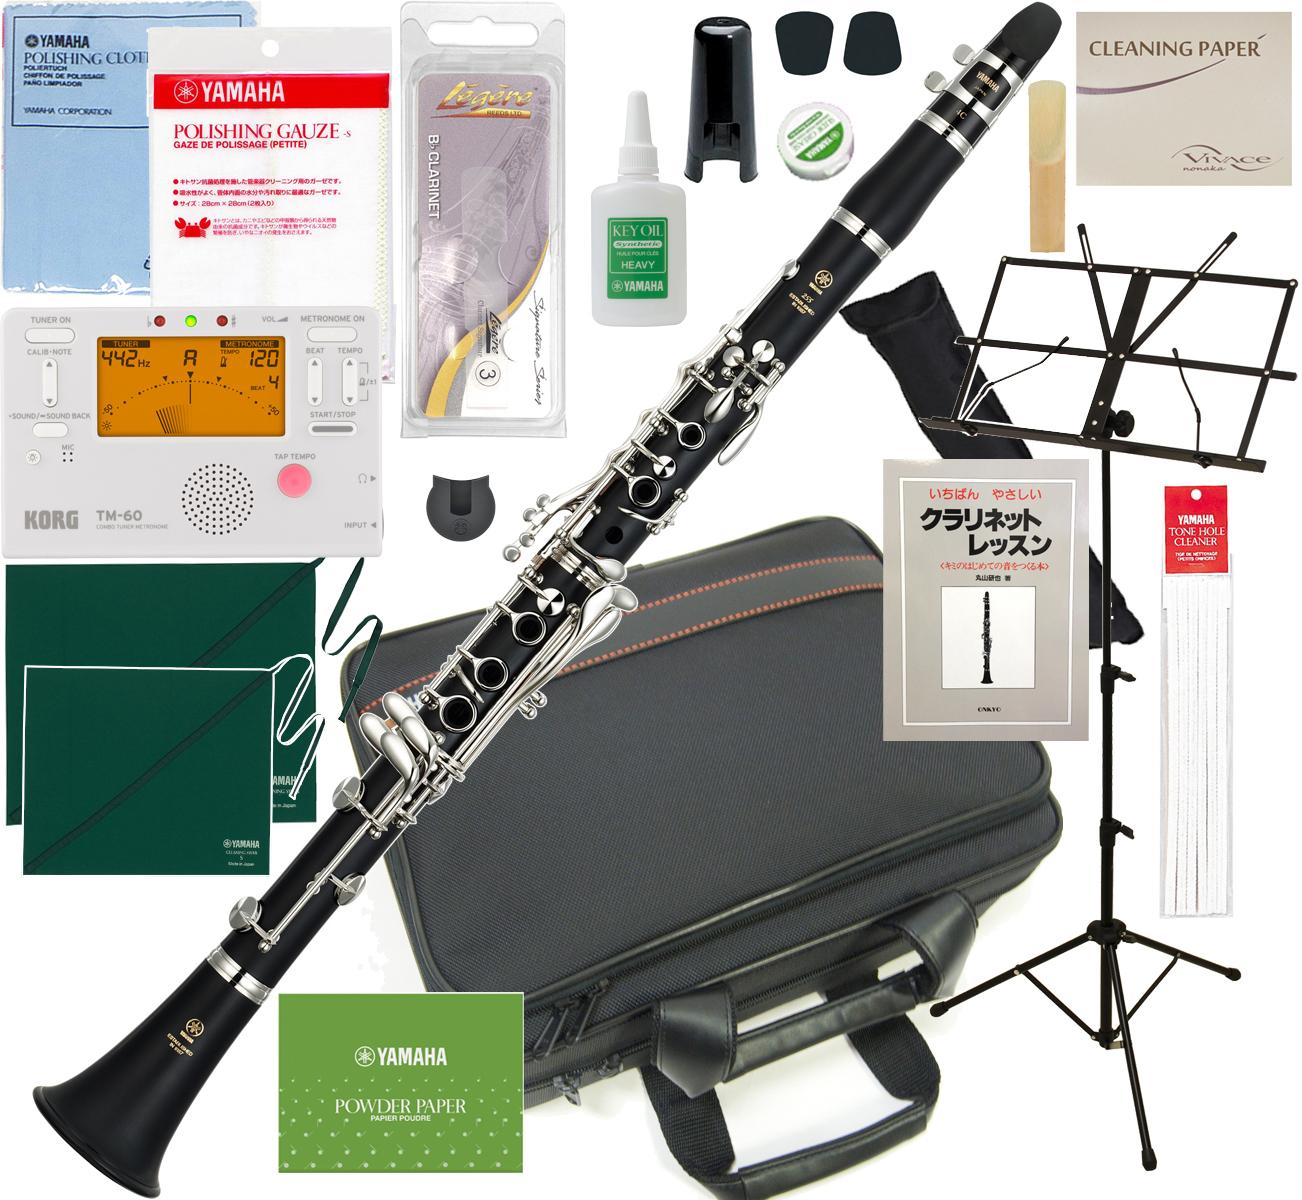 YAMAHA ( ヤマハ ) YCL-255 クラリネット 正規品 管楽器 スタンダード B♭ 本体 管体 樹脂製 Bb clarinet セット A 北海道 沖縄 離島不可